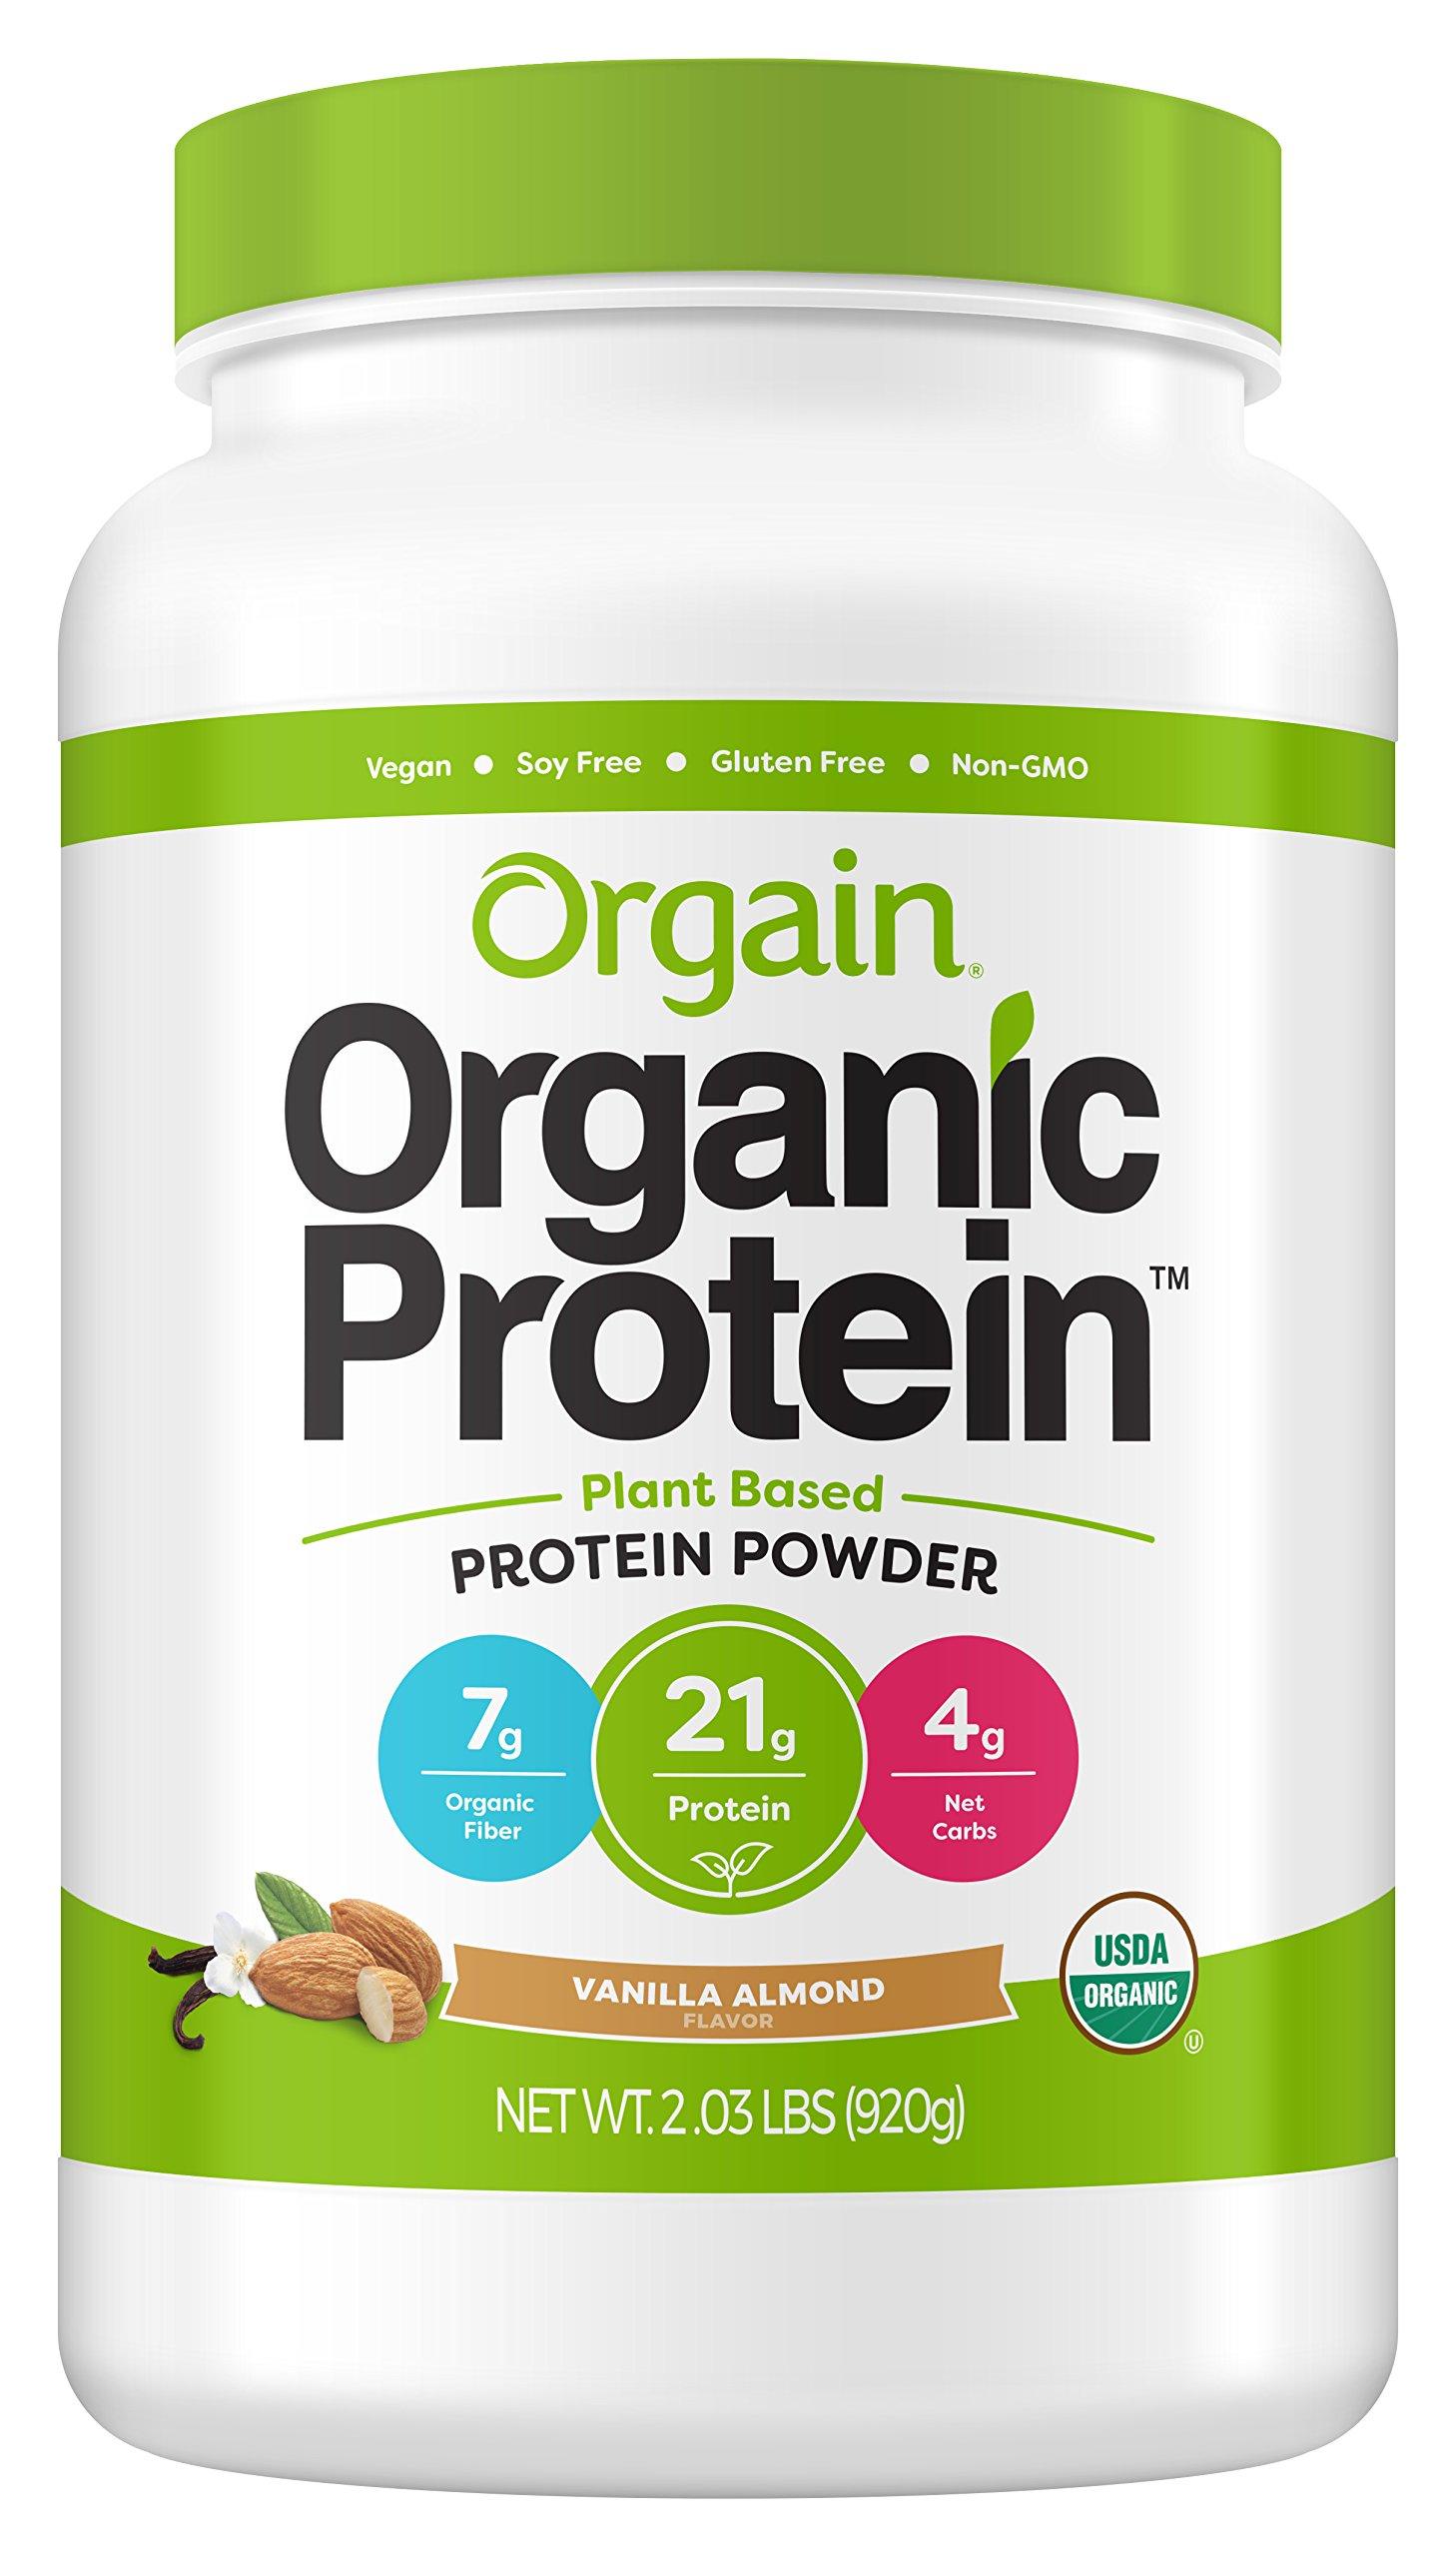 Orgain Organic Plant Based Protein Powder, Vanilla Almond, Vegan, Gluten Free, Non-GMO, 2.03 Pound, 1 Count, Packaging May Vary